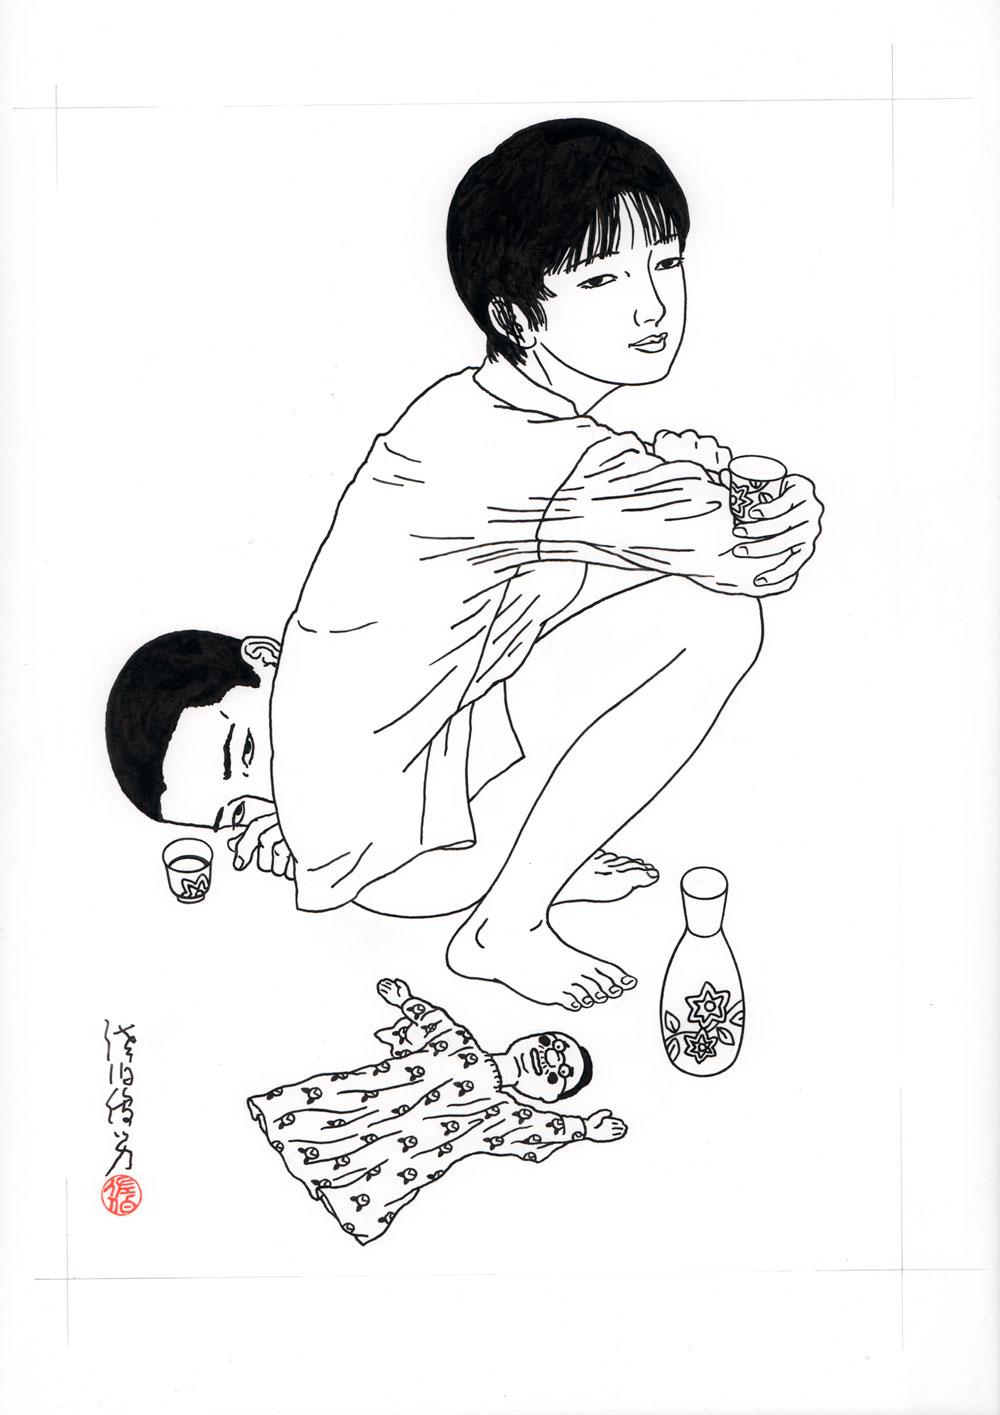 Toshio SaekiZanjou, 2015Ink on paper.12.5 x 17.5 in. unframed